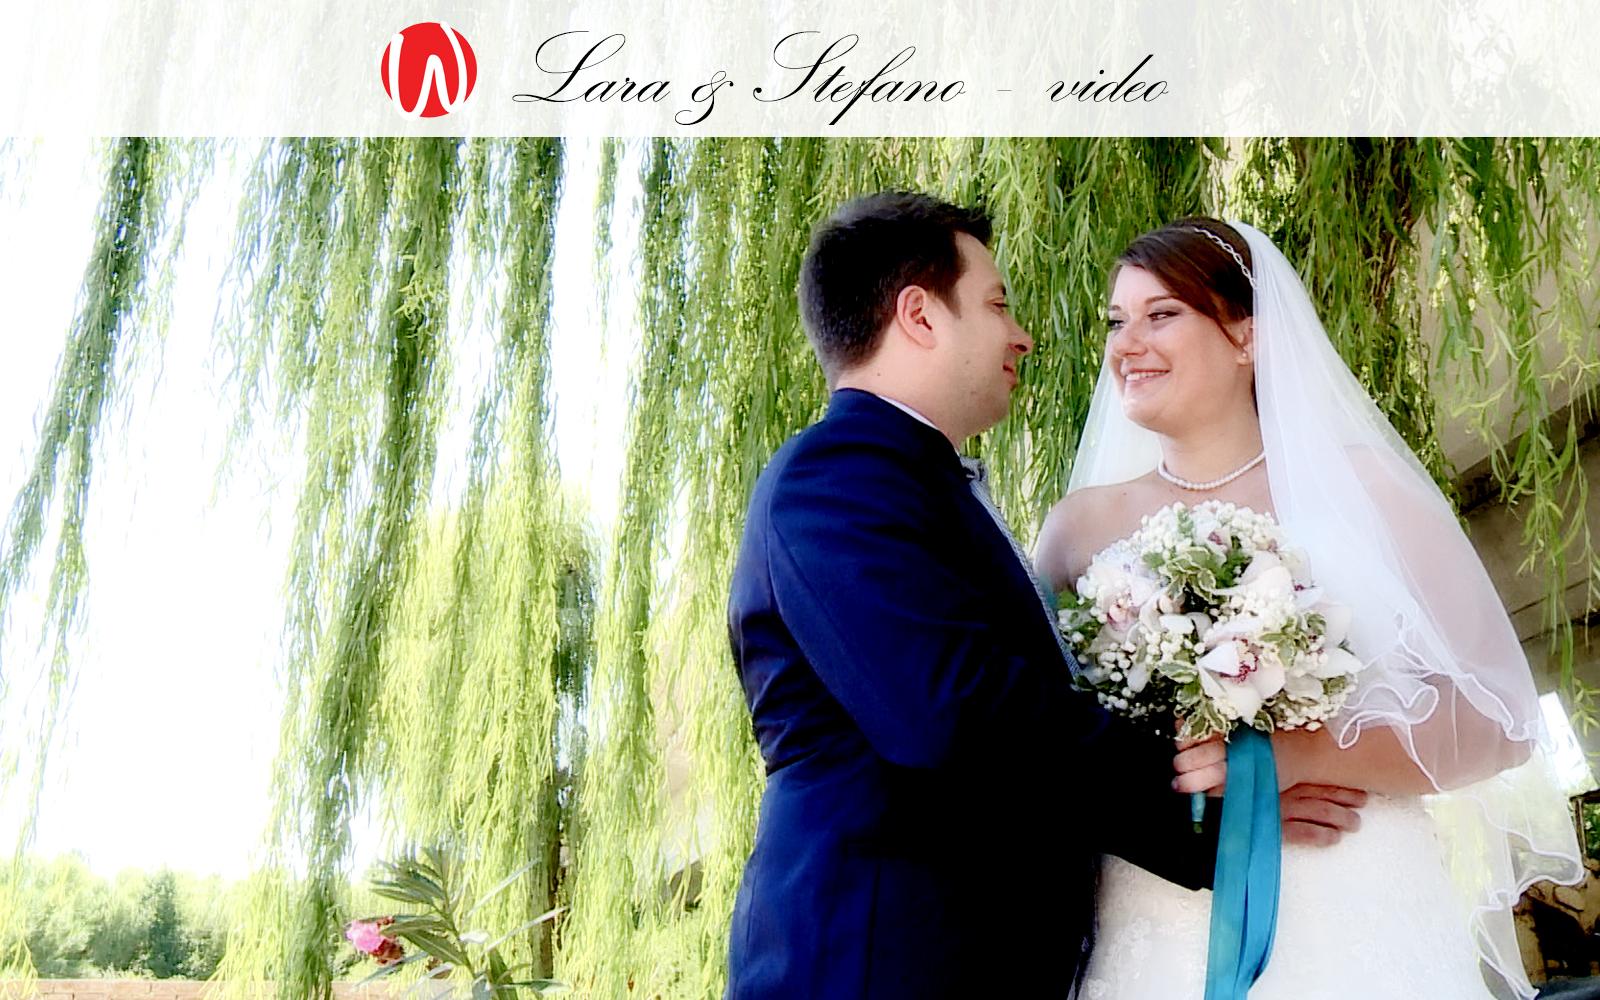 Lara & Stefano